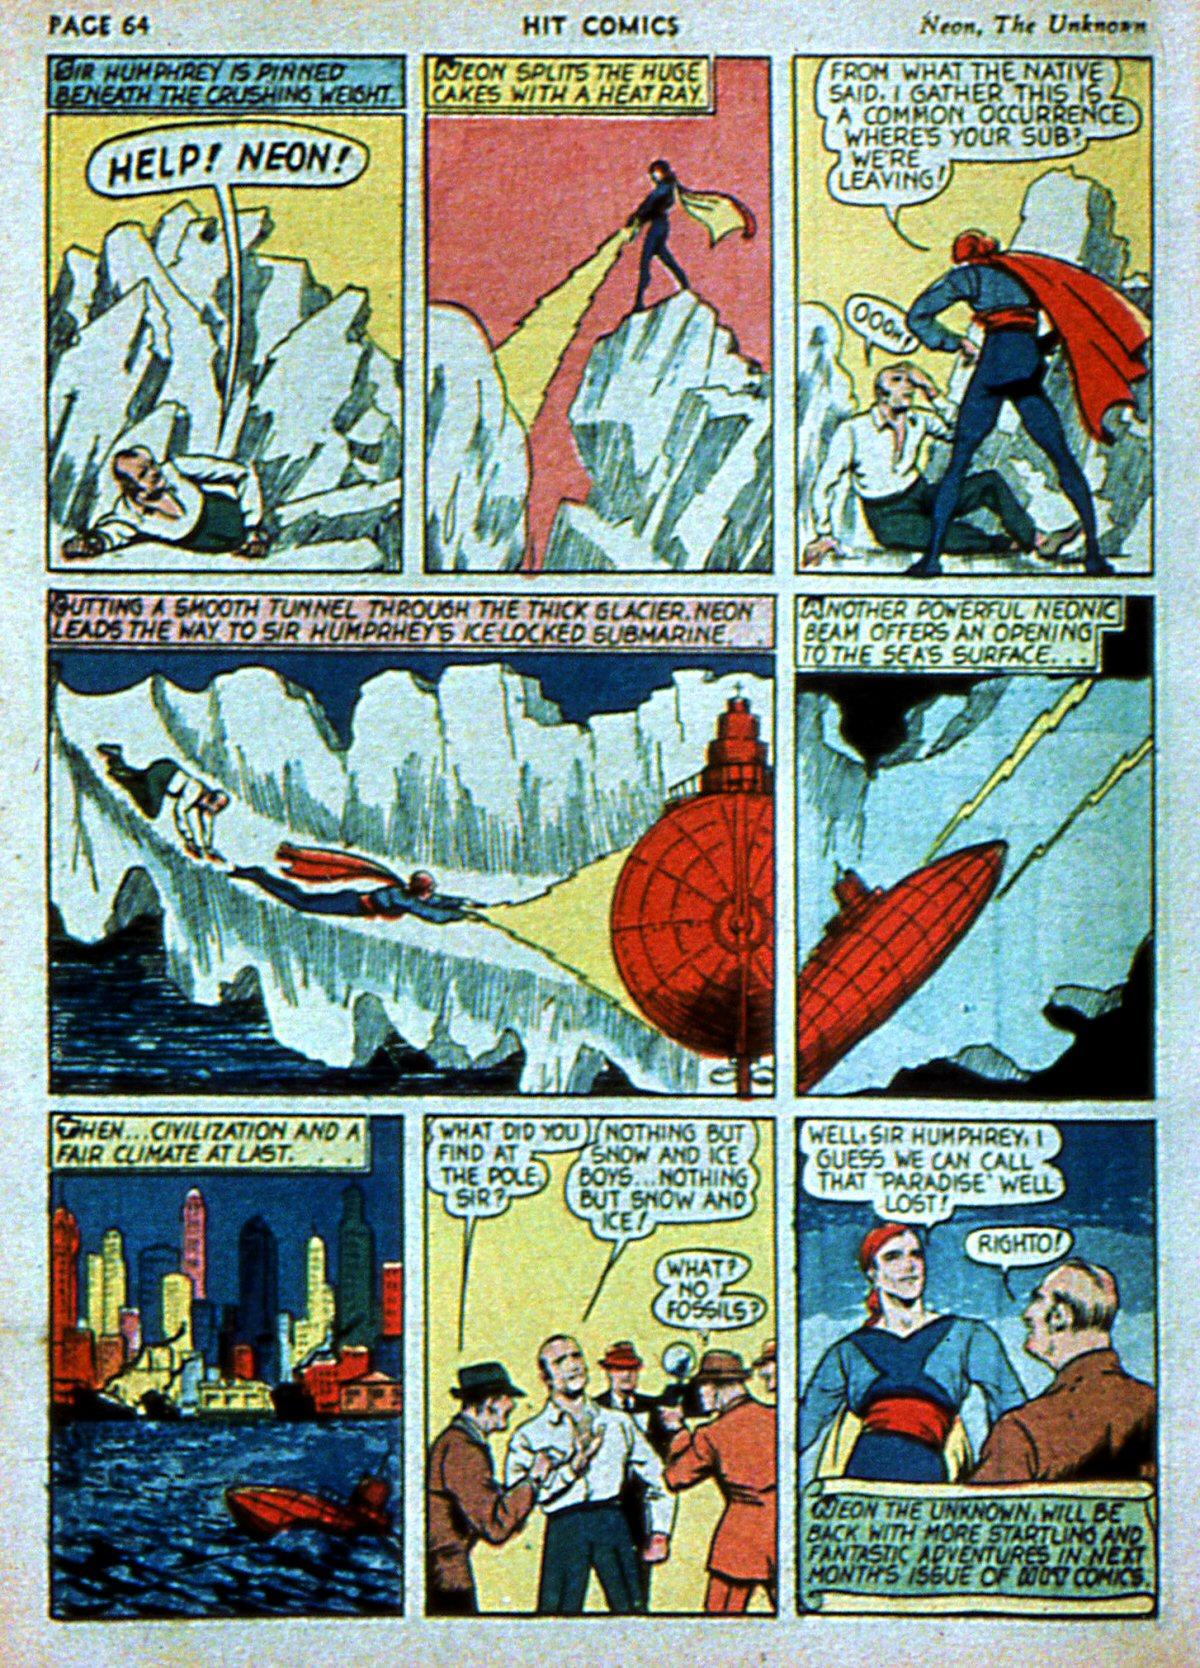 Read online Hit Comics comic -  Issue #3 - 66